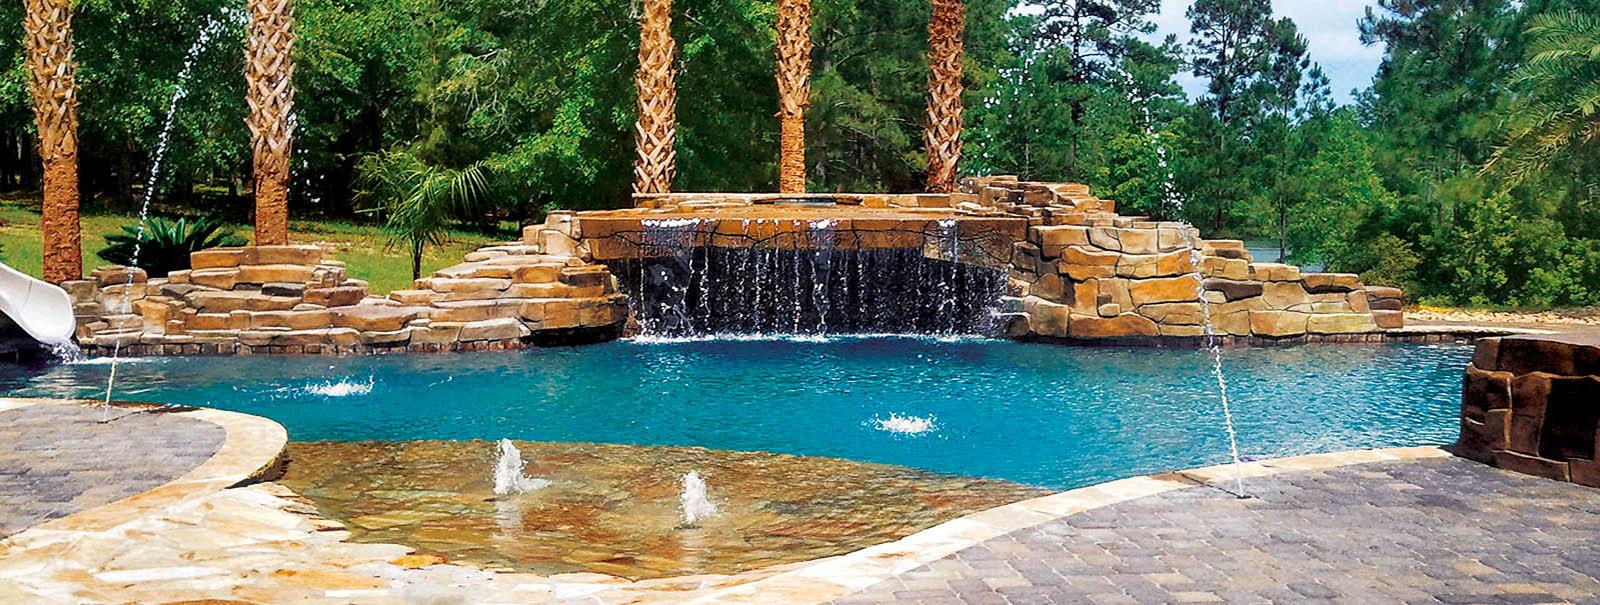 Mobile Custom Swimming Pool Builders Blue Haven Pools